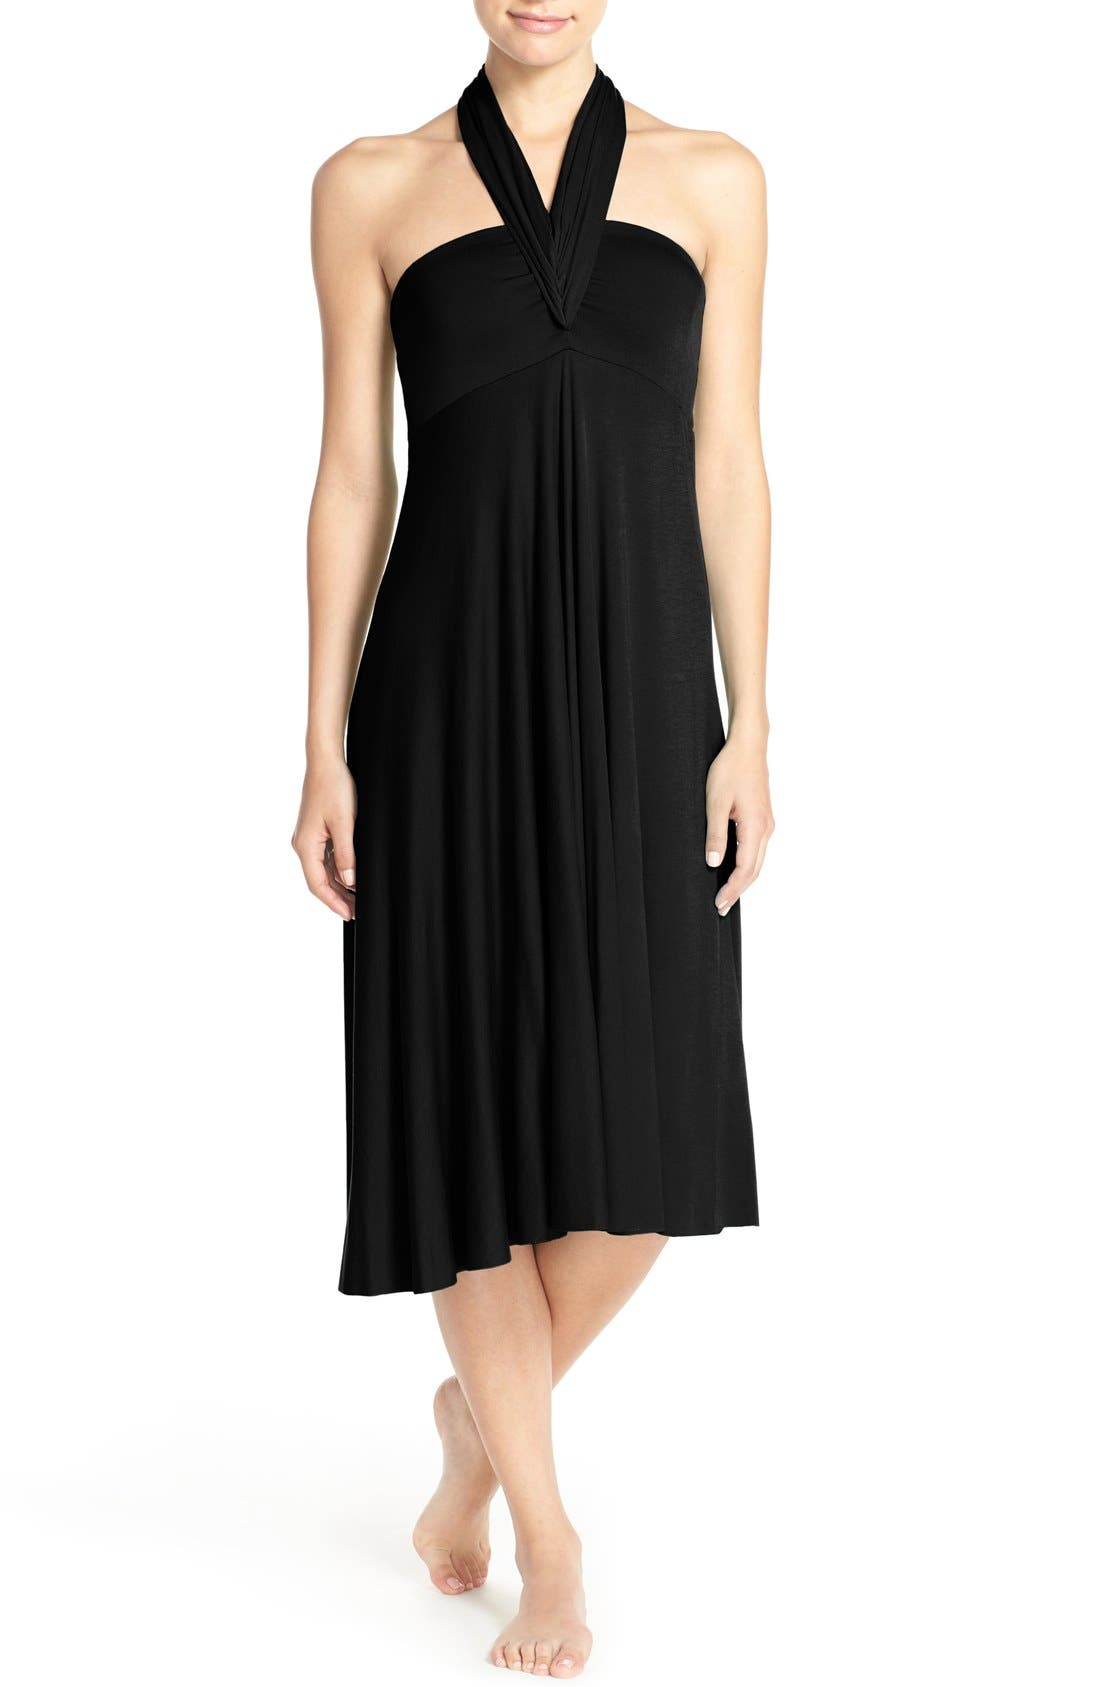 Alternate Image 1 Selected - Elan Convertible Cover-Up Dress